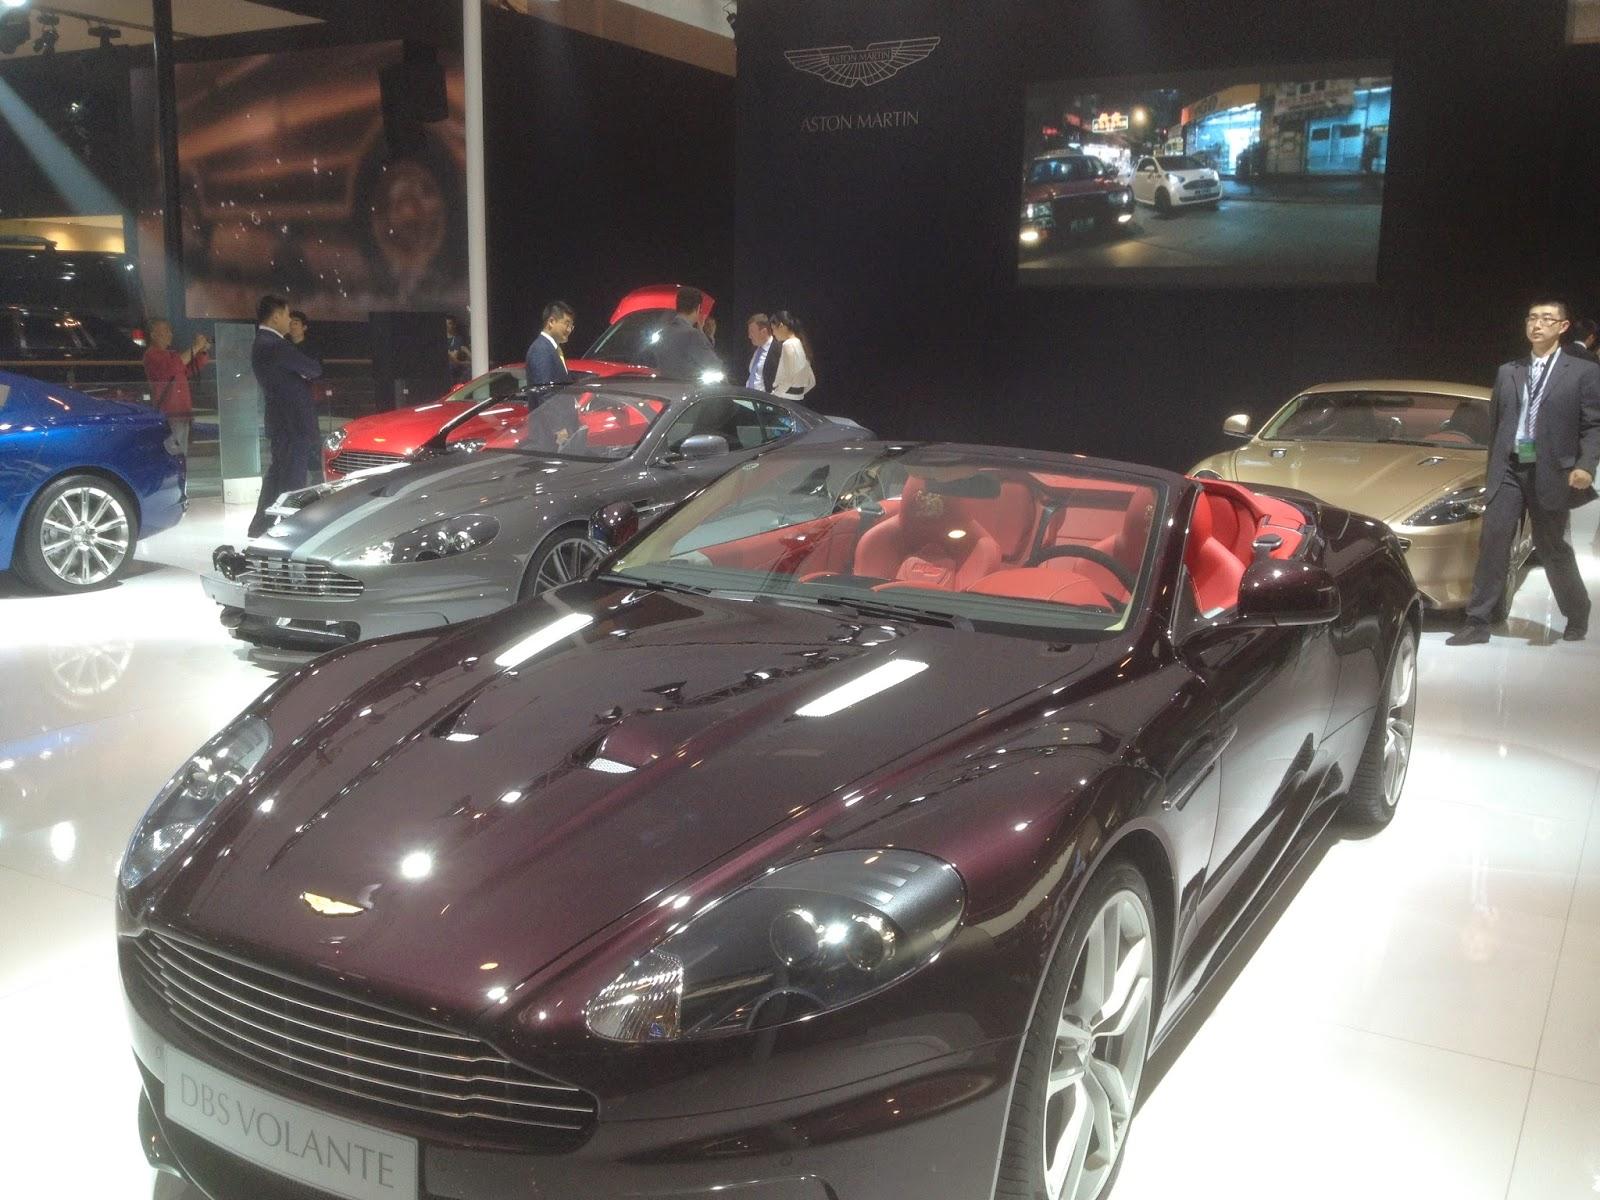 ... trình làng [Aston Martin DBS Volante - Dragon 88 Limited Edition